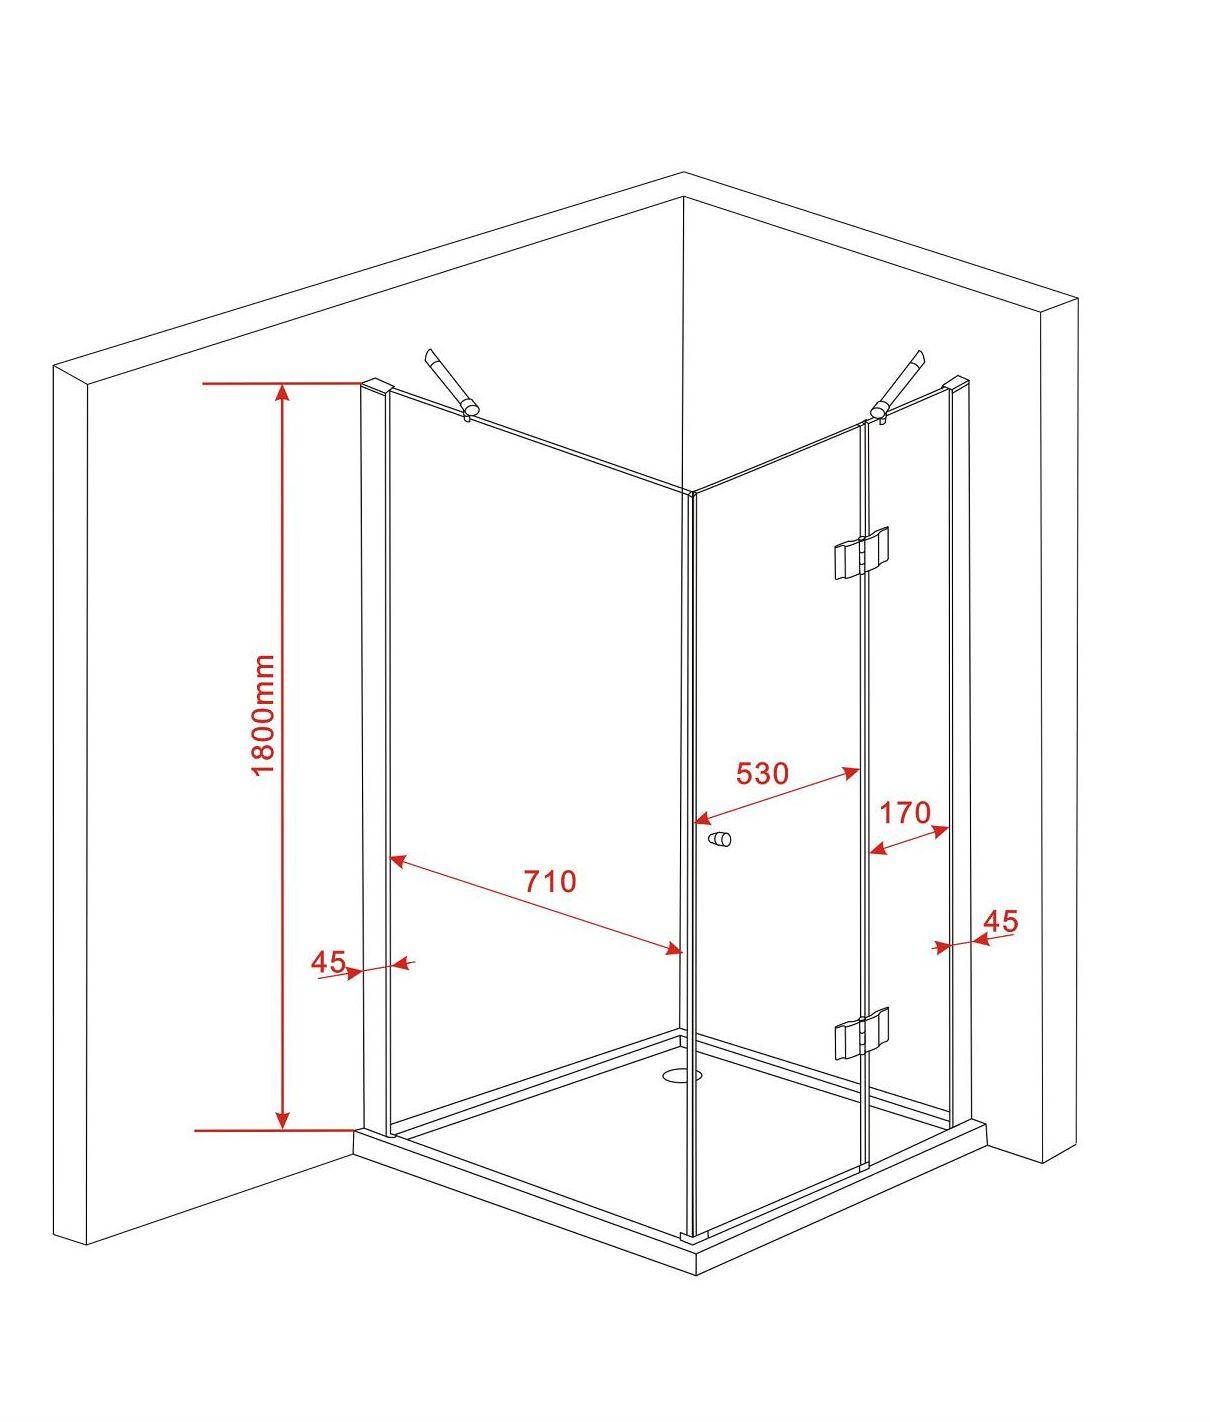 sill 80 x 80 x 180 duschtasse glas duschkabine duscht r dusche duschabtrennung ebay. Black Bedroom Furniture Sets. Home Design Ideas